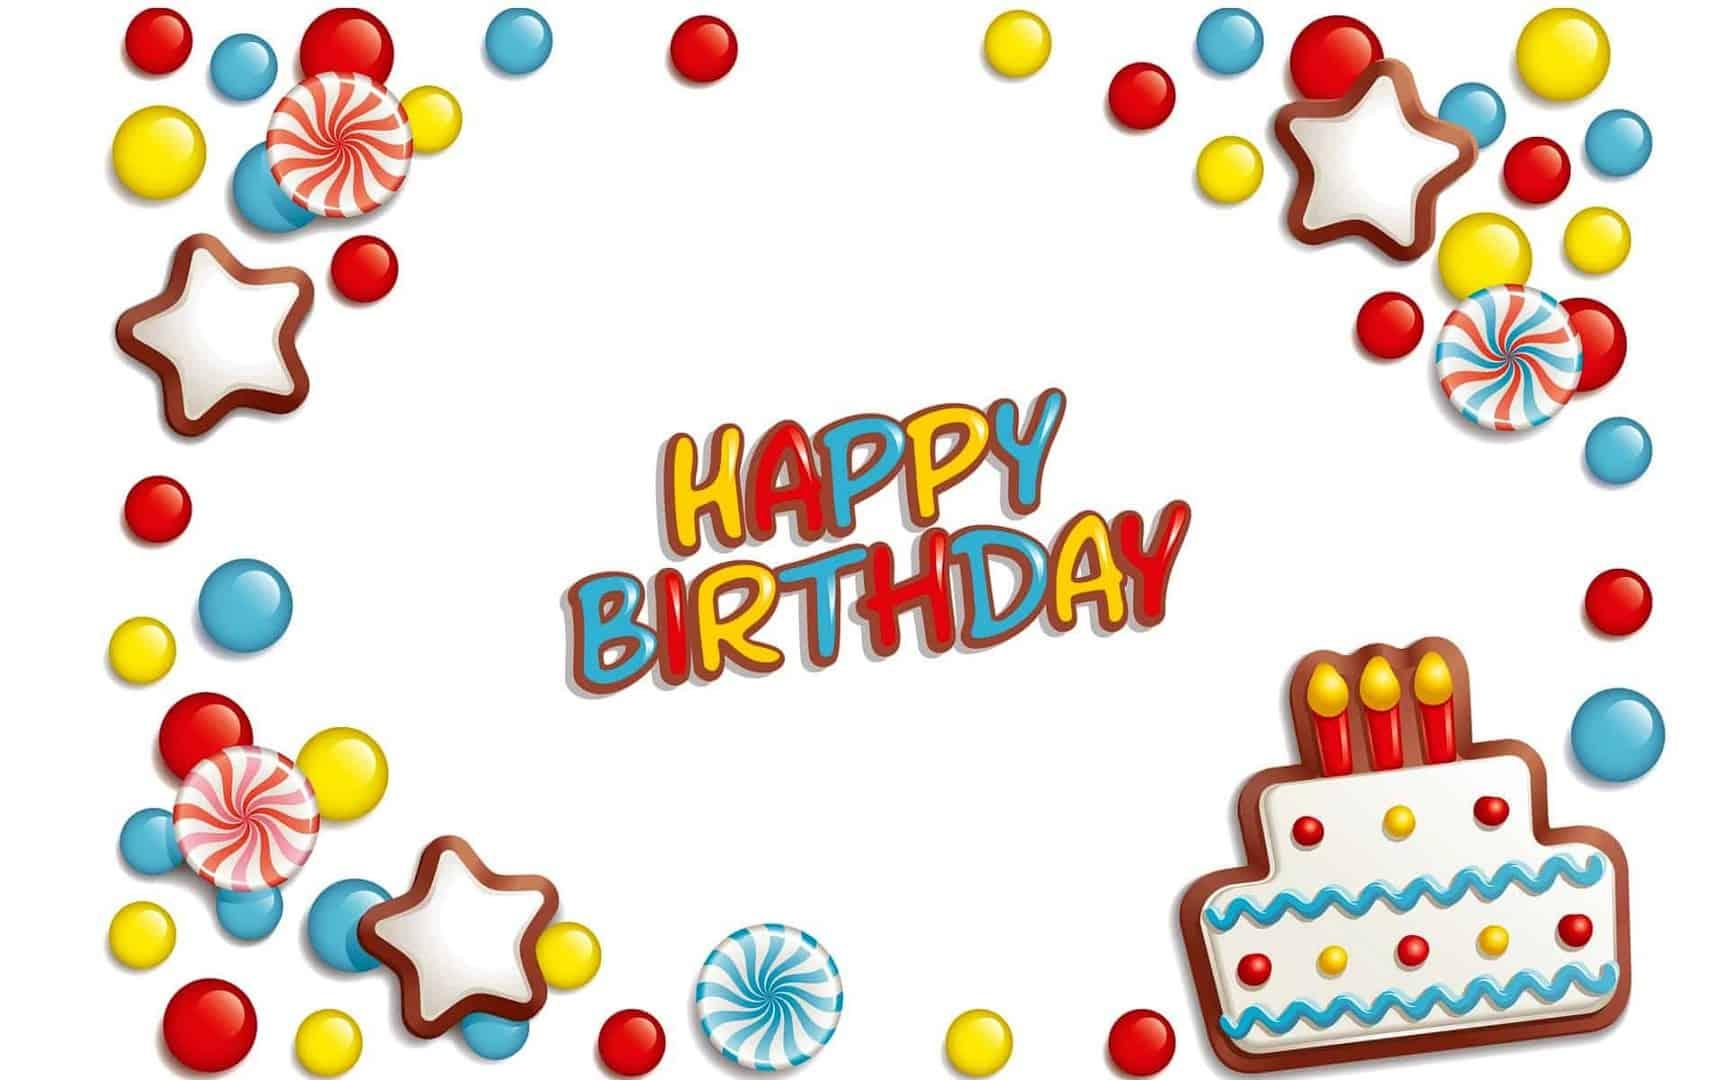 Animated Birthday wishes Images GIF - Happy Birthday to you! - Happy Birthday wishes!